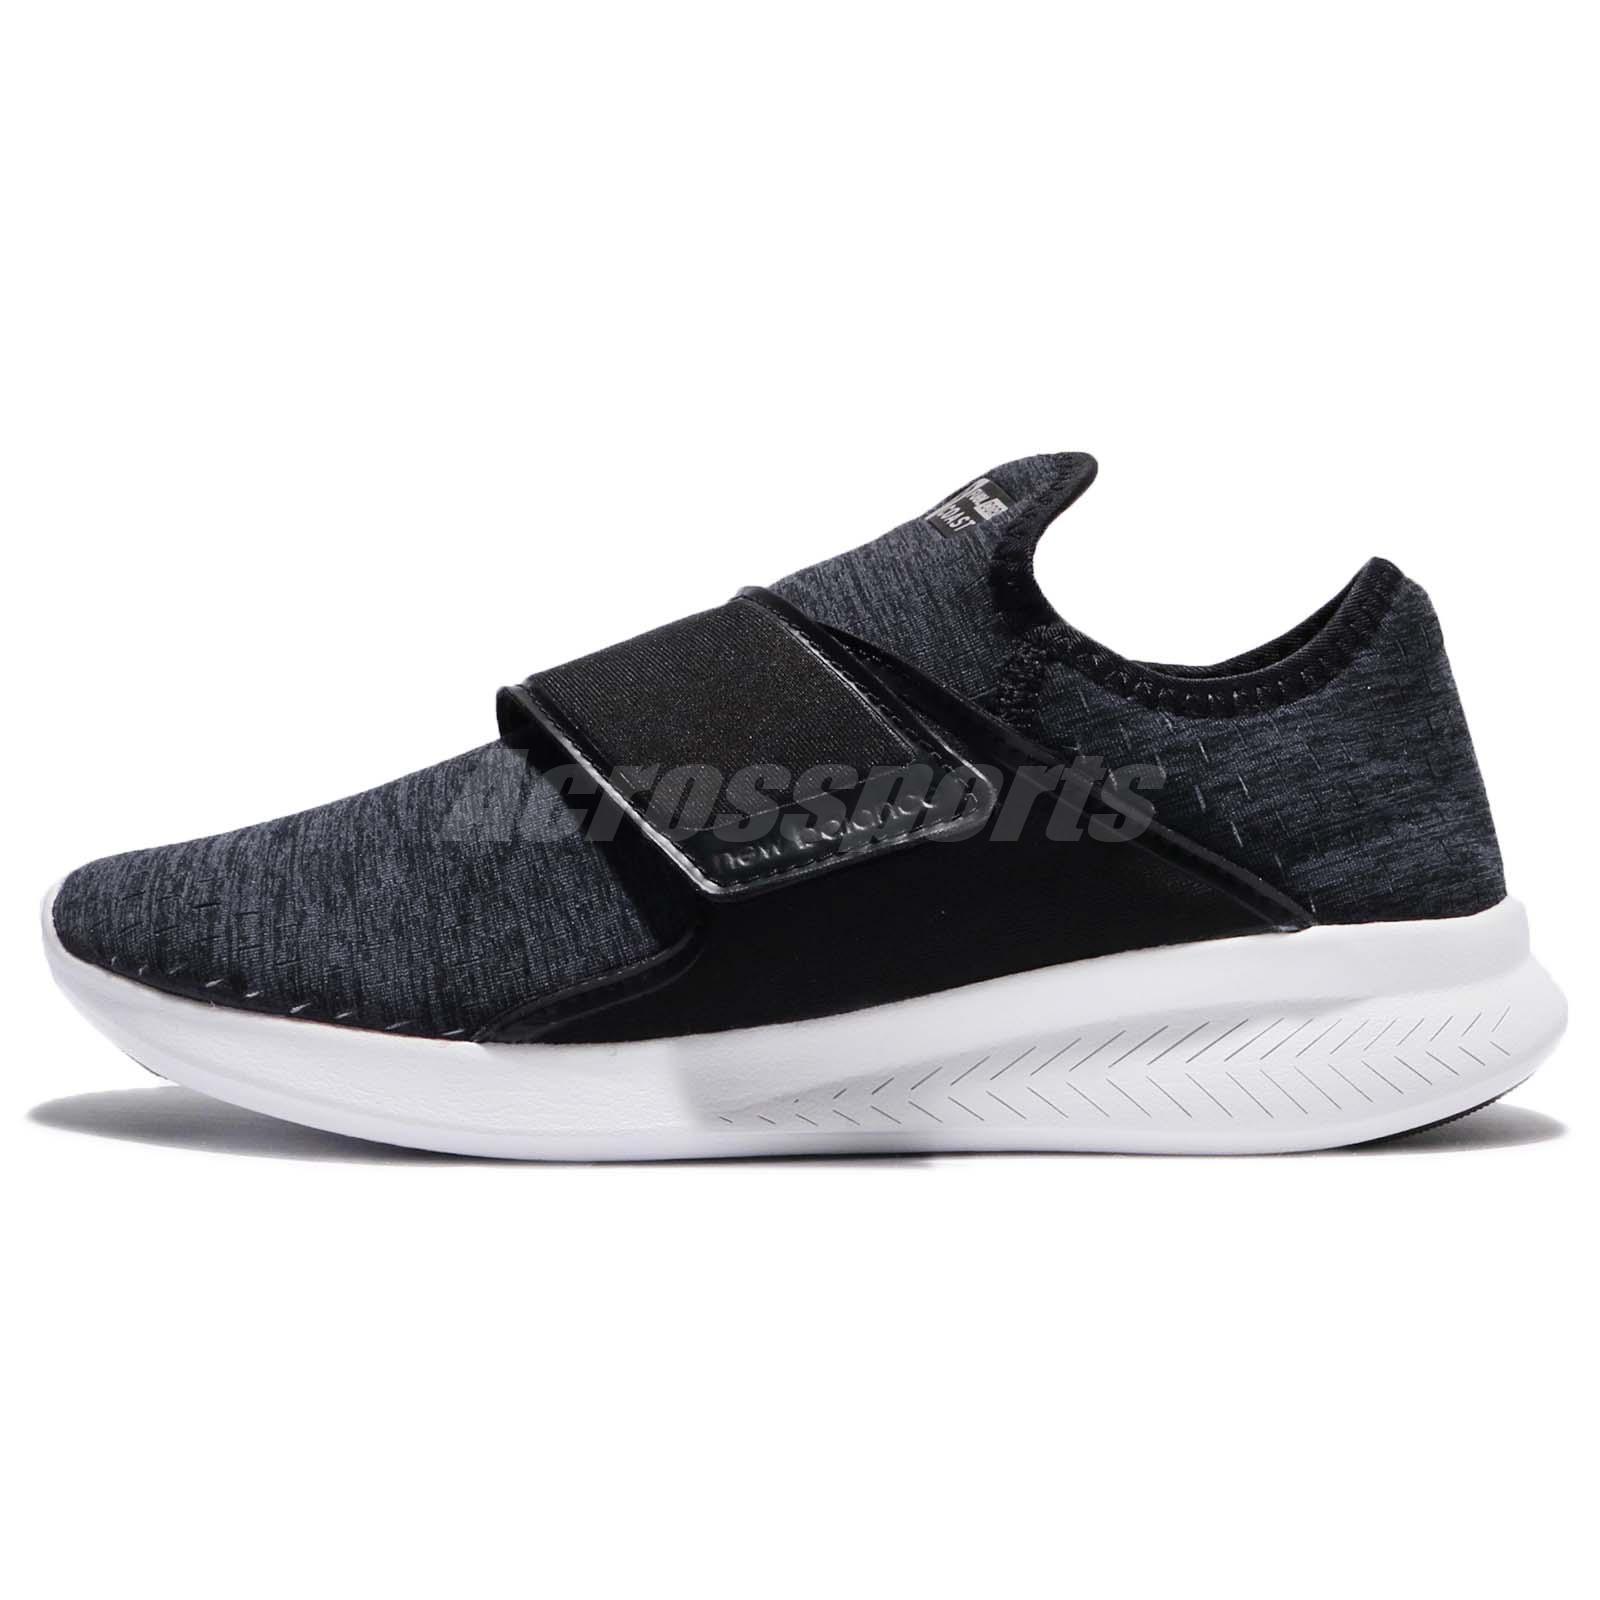 2b759589b11e1 New Balance WCOASHB3 D Fuel Core Coast Black Grey Women Running Shoes  WCOASHB3D